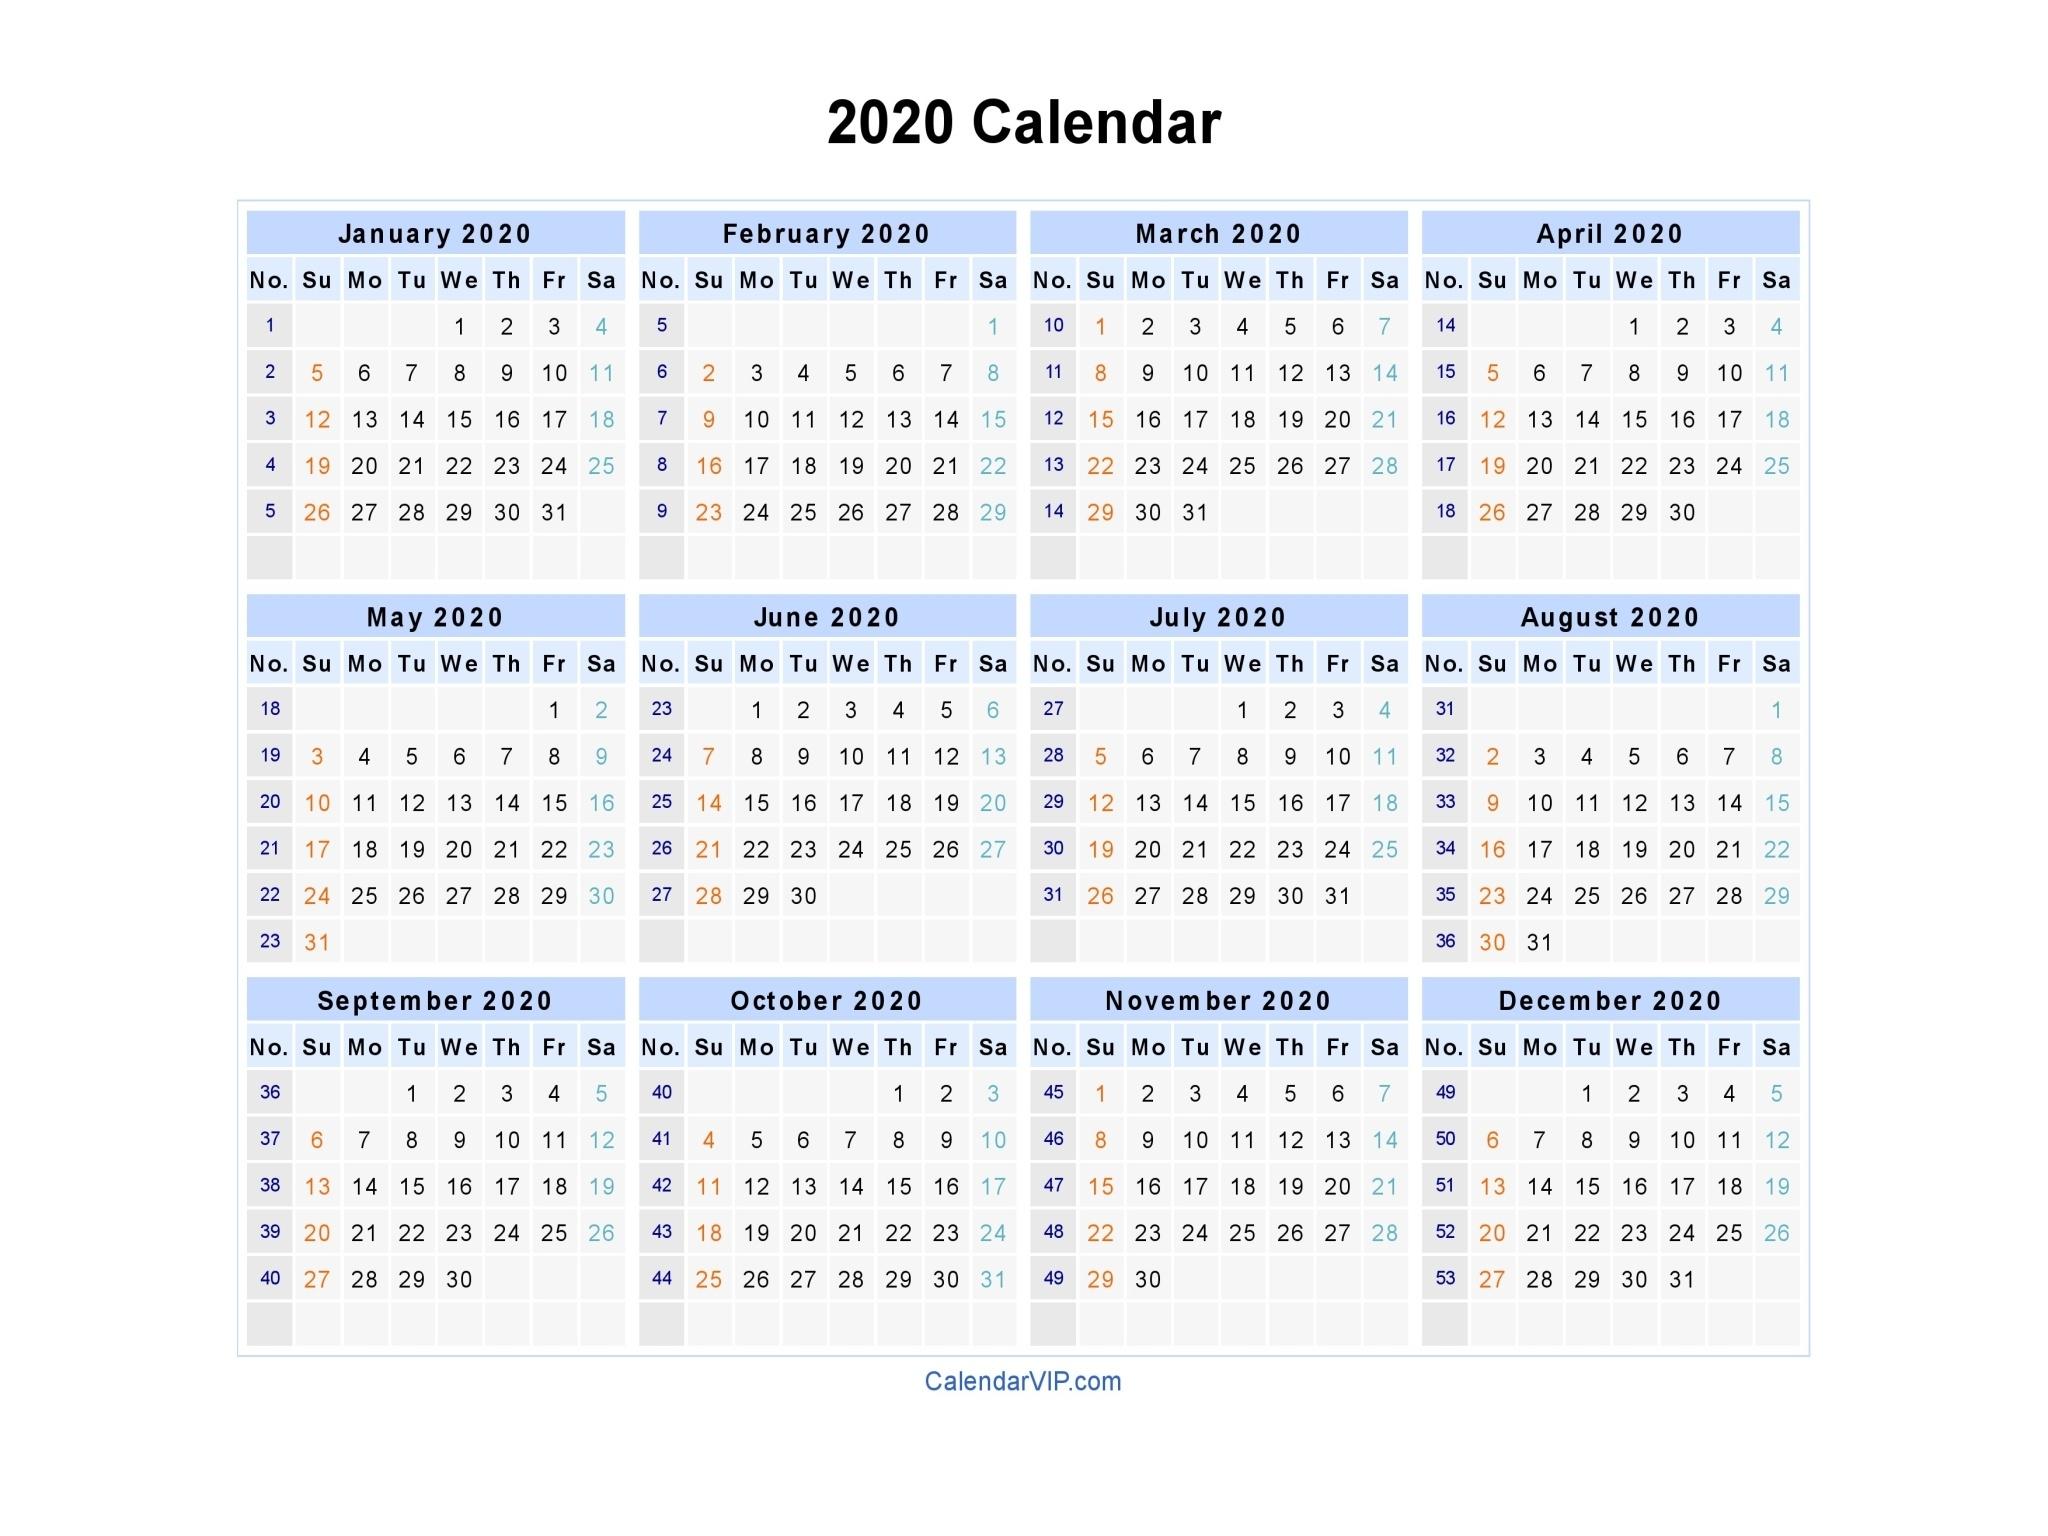 2020 Calendar - Blank Printable Calendar Template In Pdf Word Excel_3 Month Blank Calendar 2020